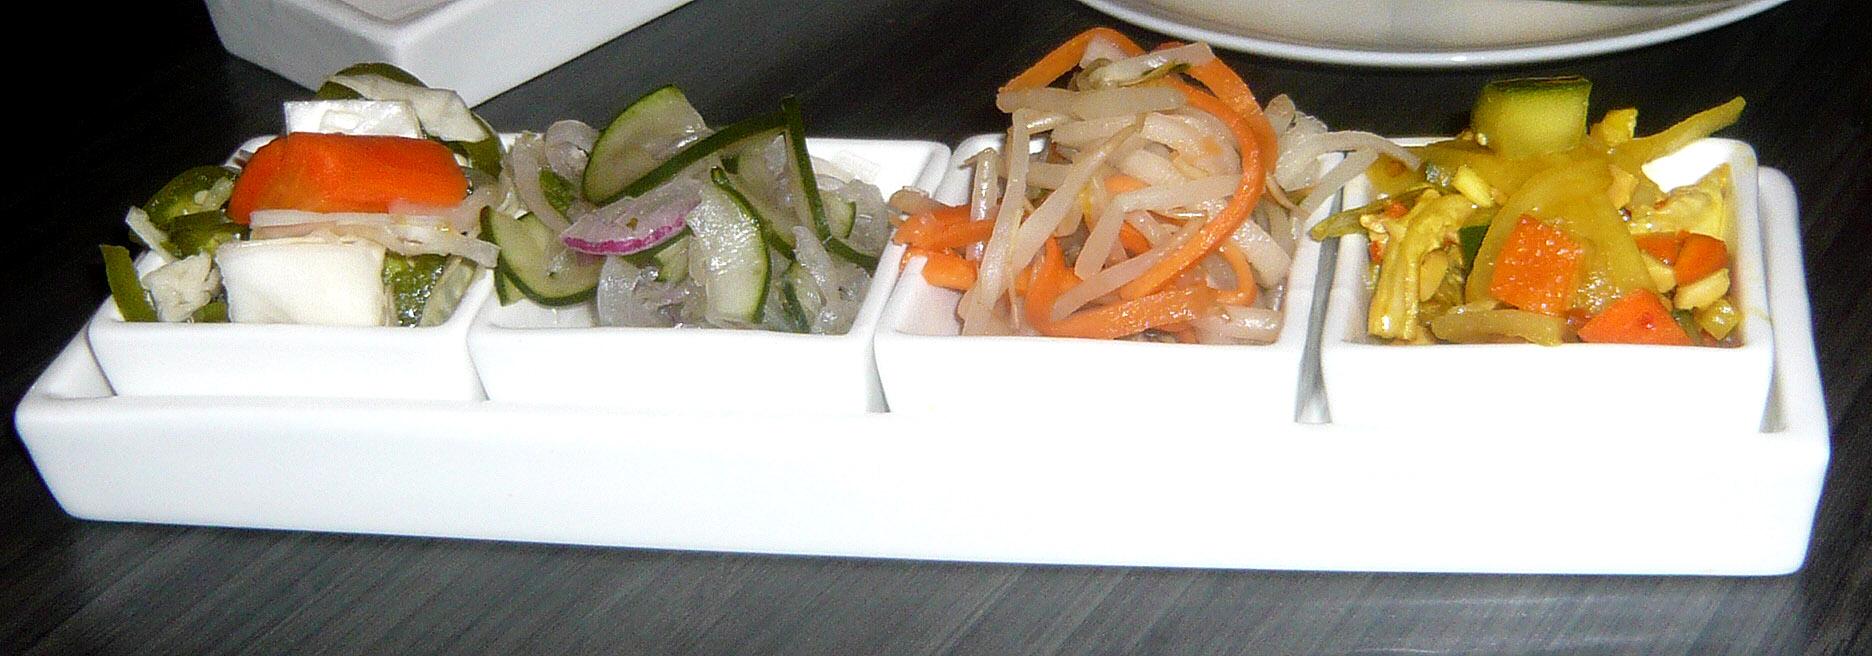 Street Kitchen Asian Bistro: Suddenly It All Makes Sense - Ruth Tobias